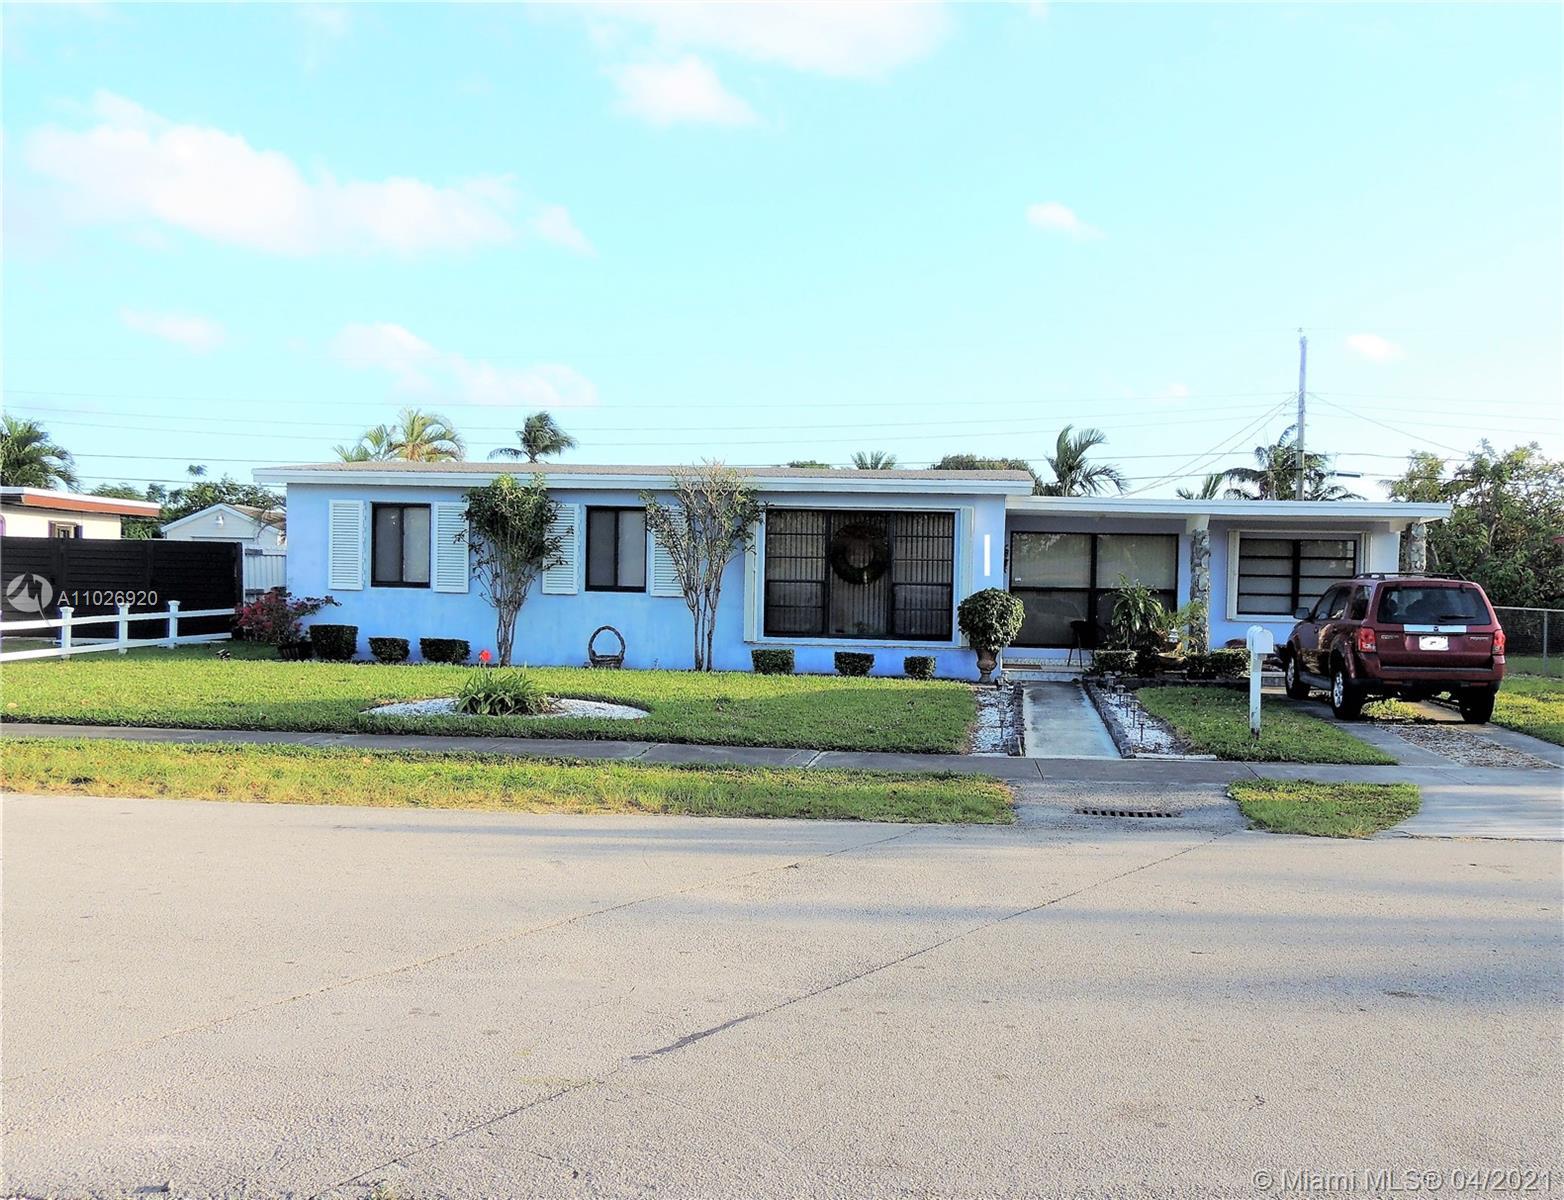 Westwood Lake - 10850 SW 40th Ter, Miami, FL 33165